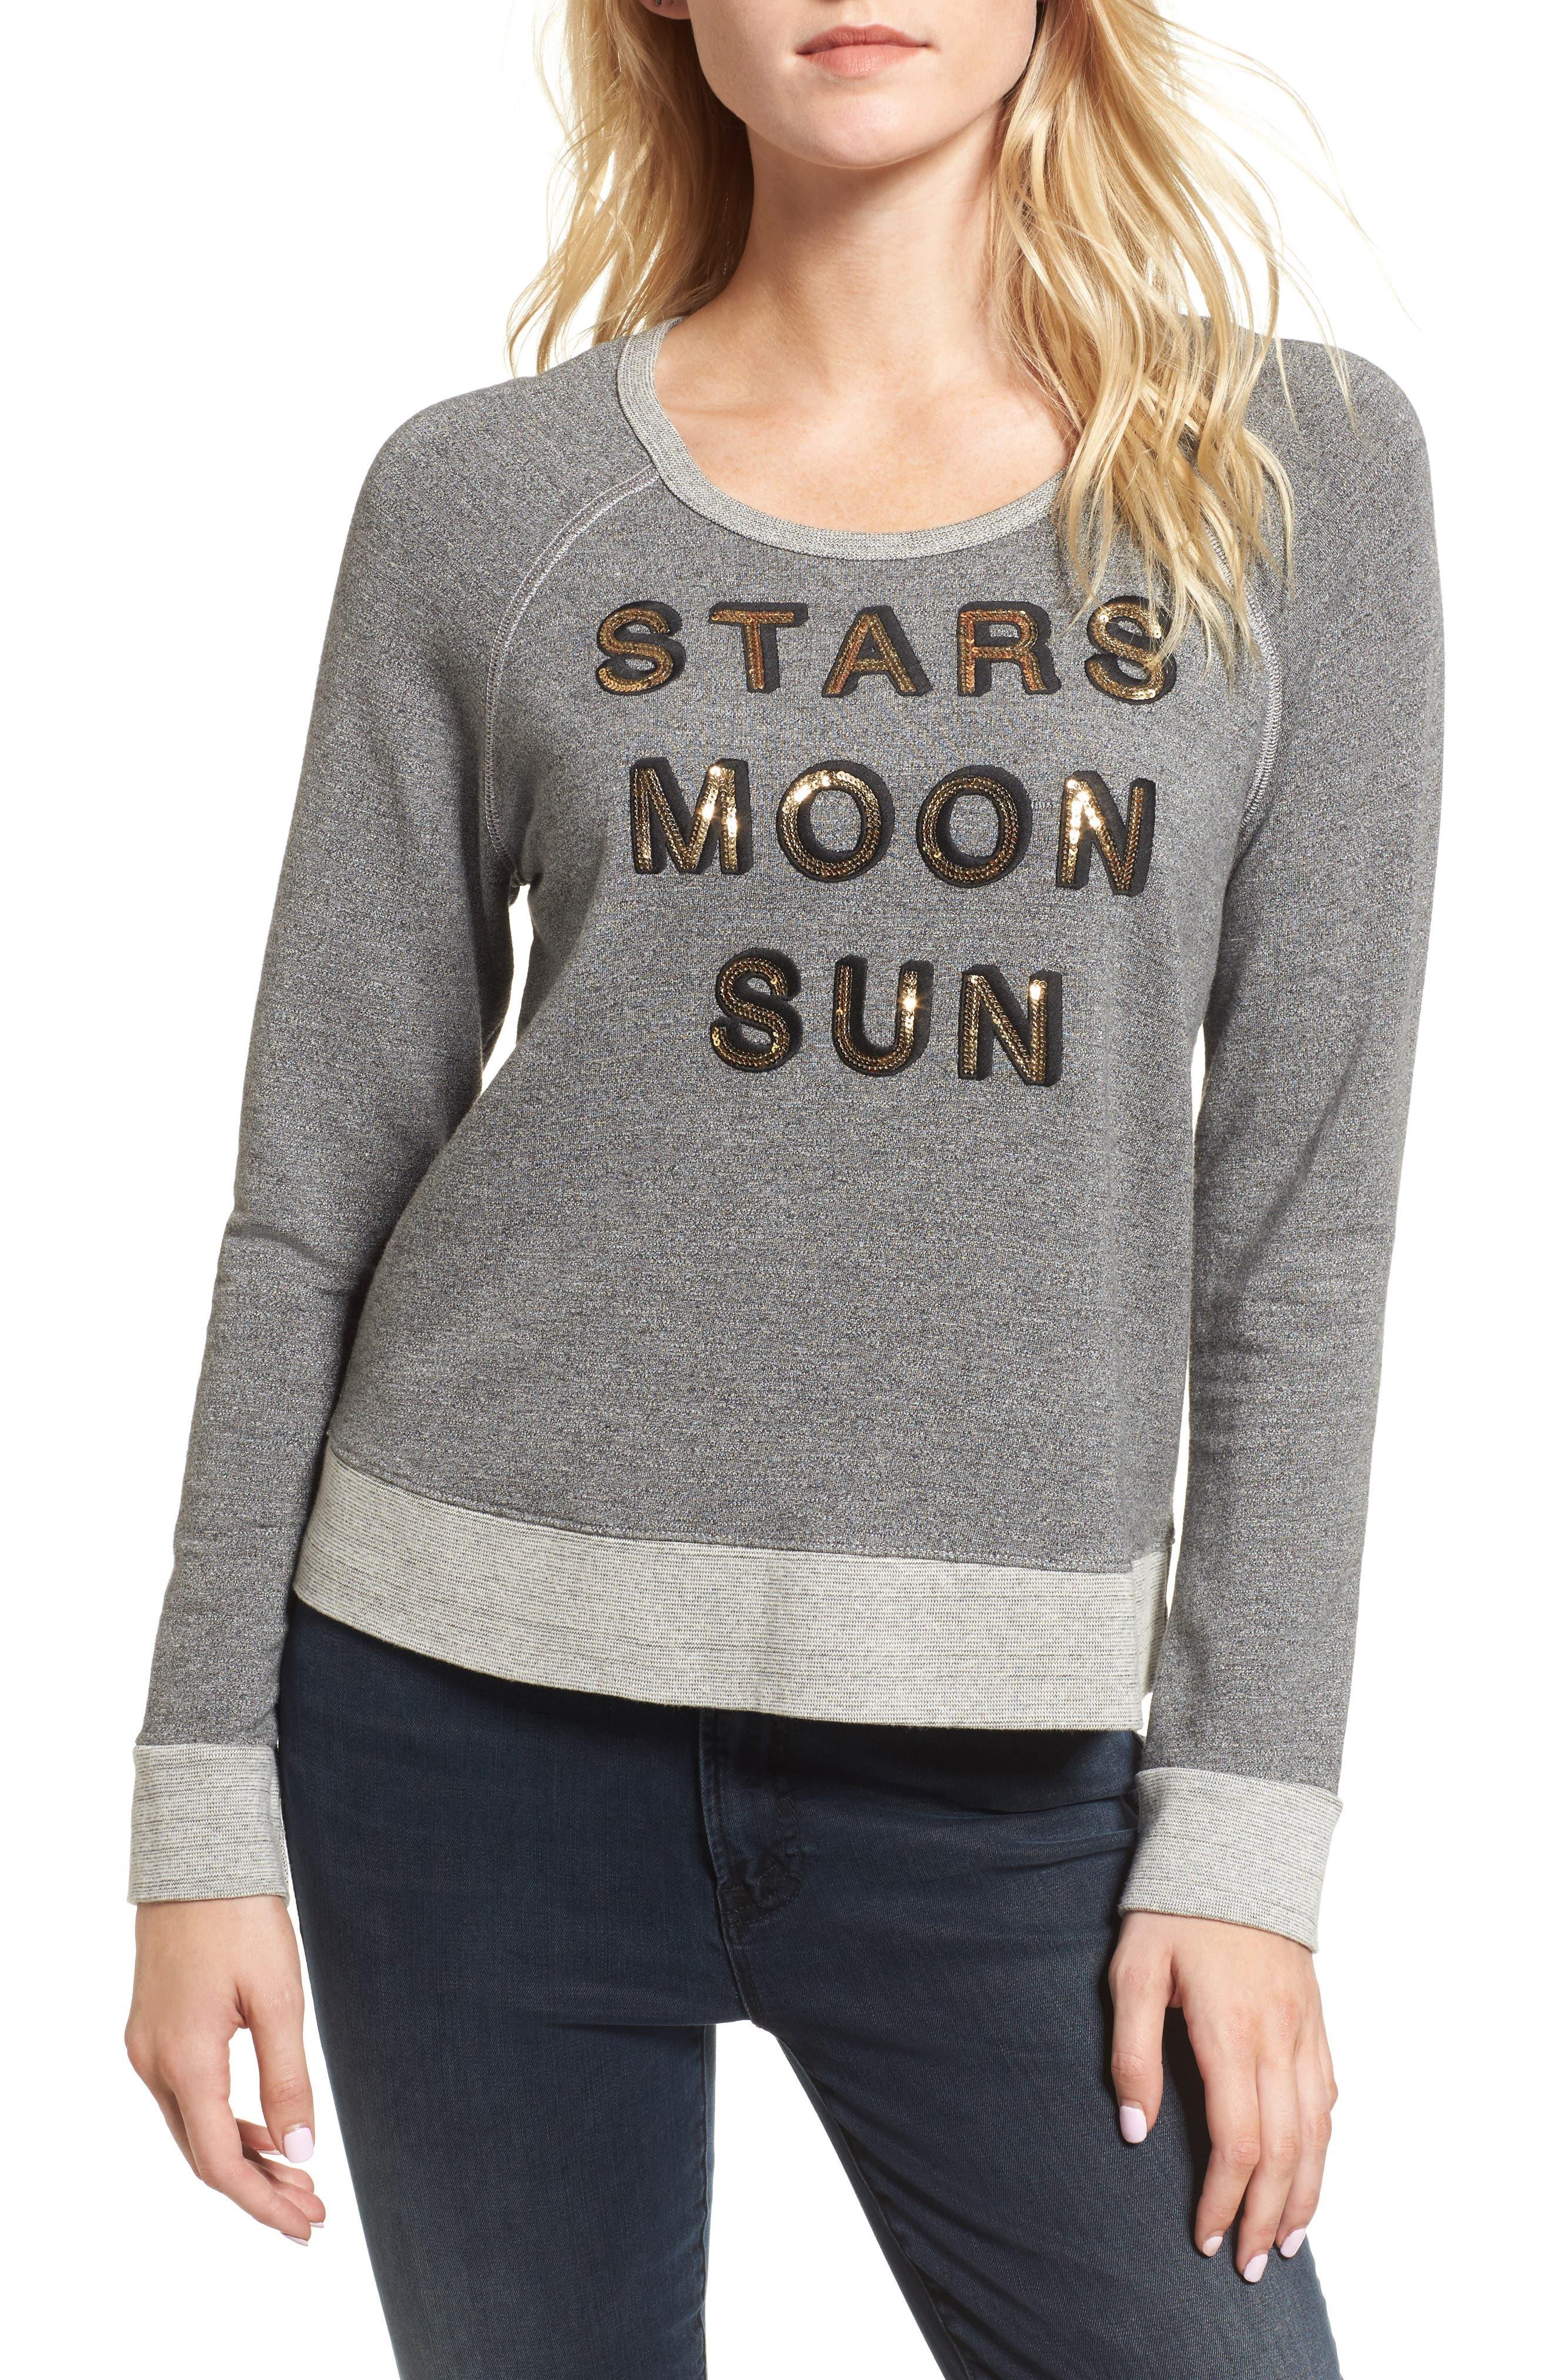 Main Image - Sundry Stars Moon Sun Crop Sweatshirt